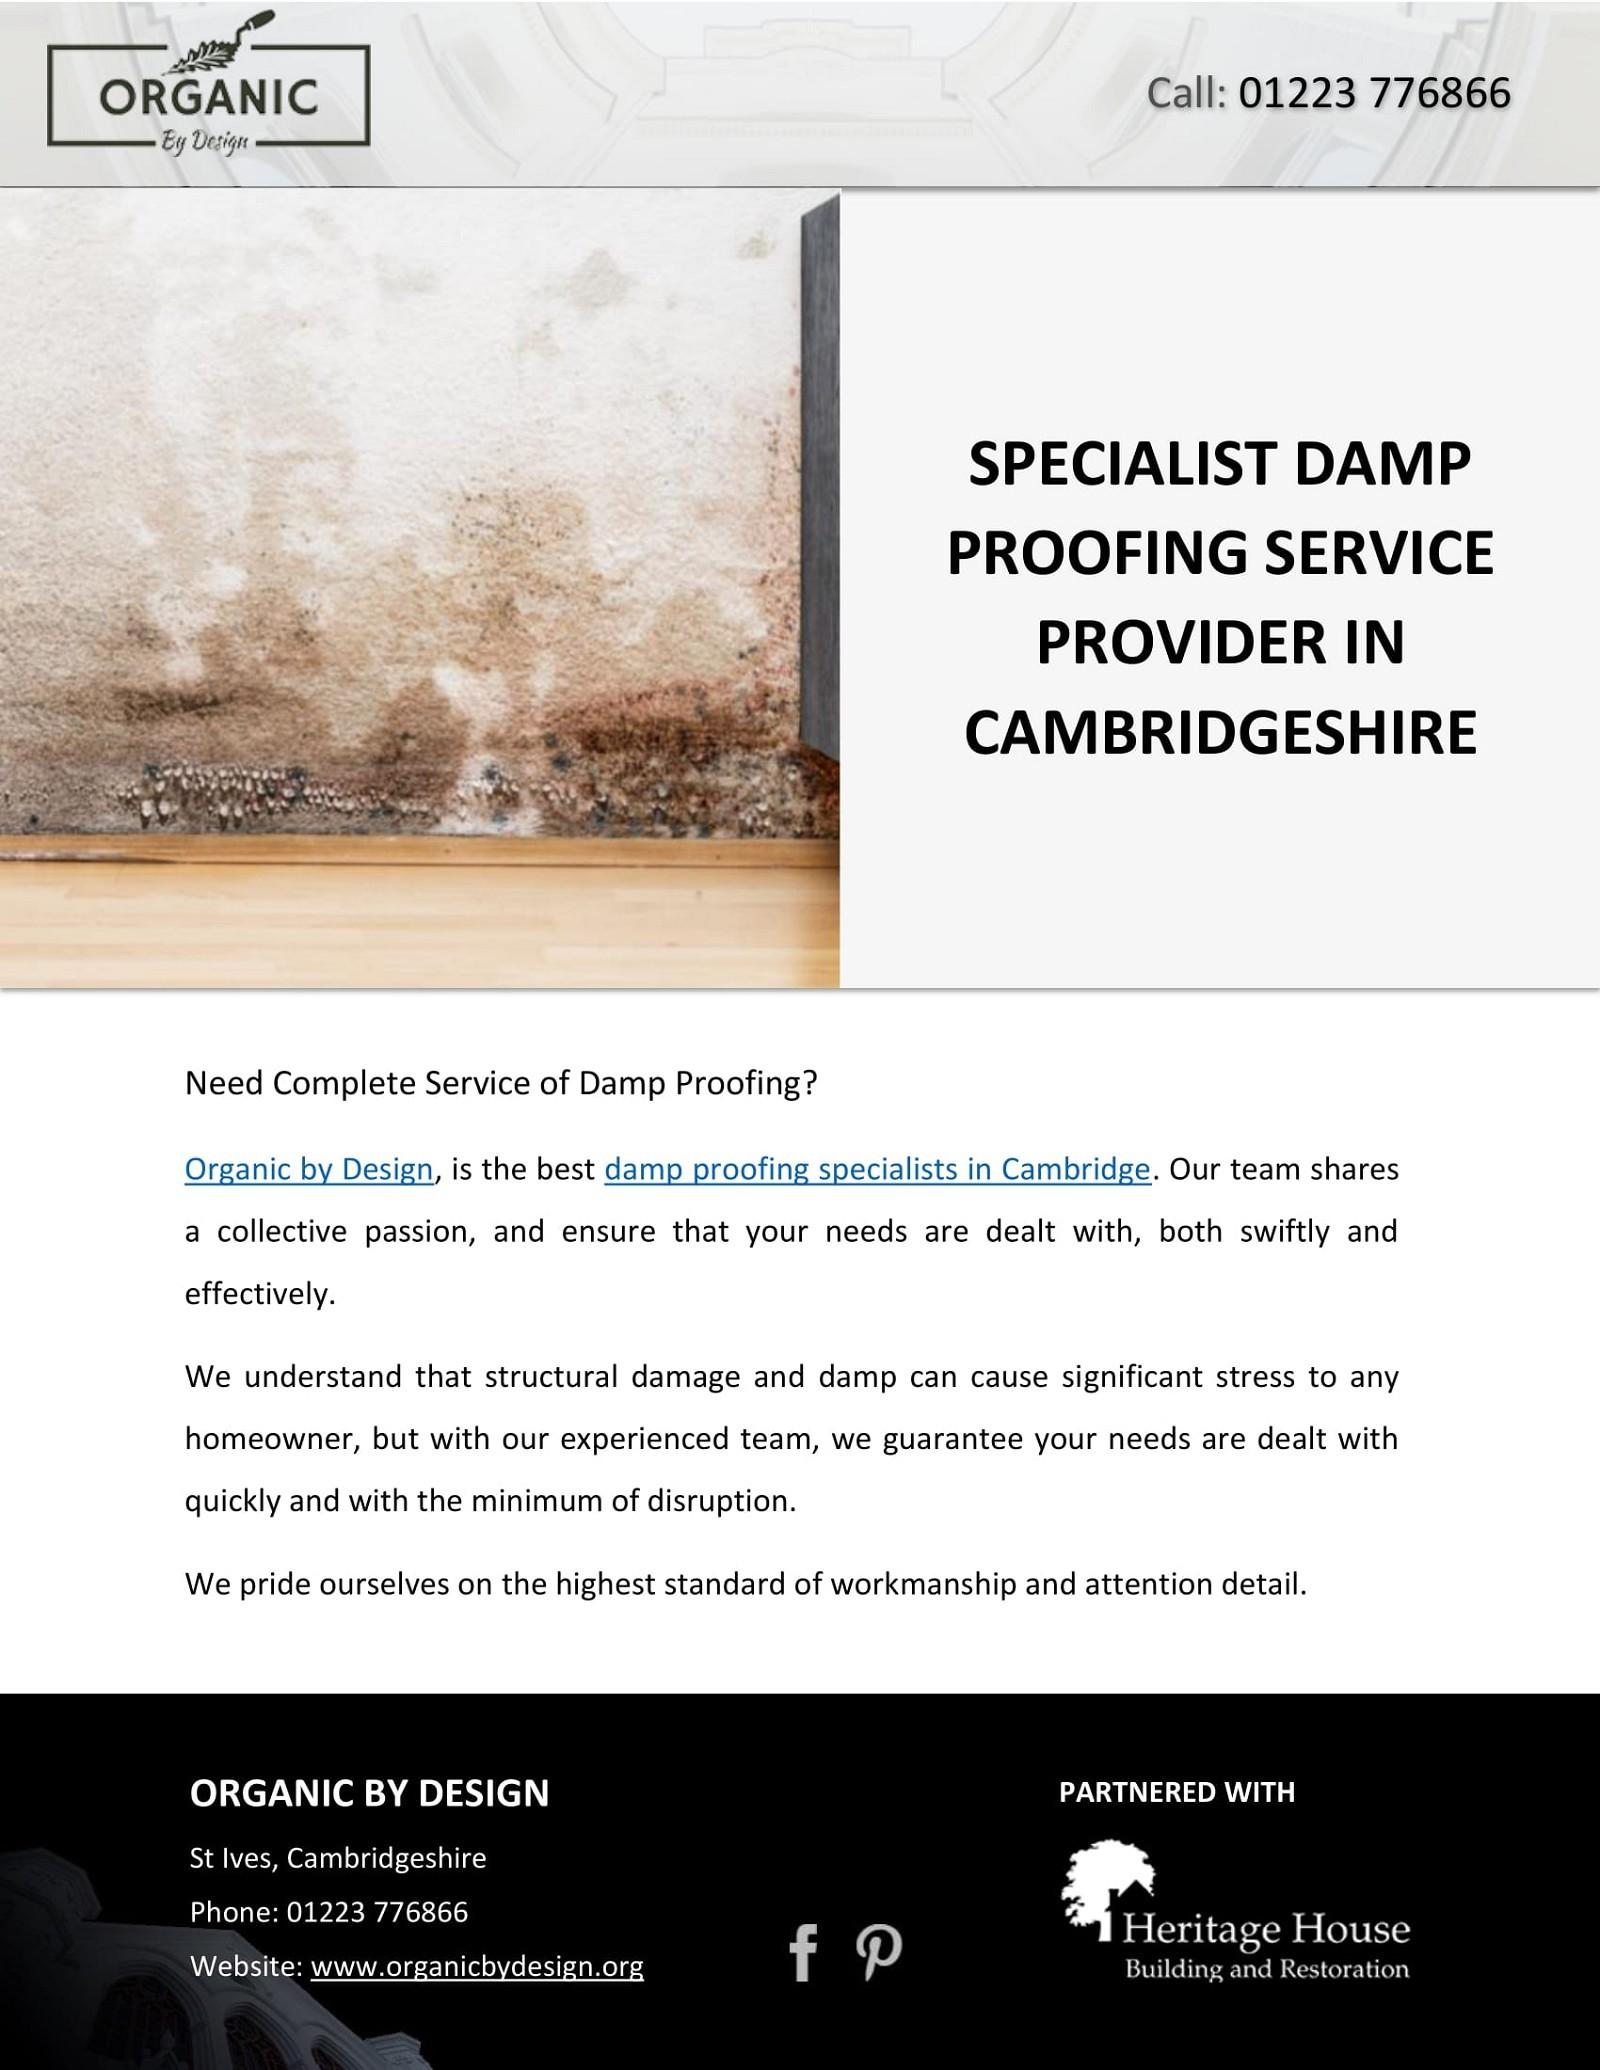 SPECIALIST DAMP PROOFING SERVICE PROVIDER IN CAMBRIDGESHIRE